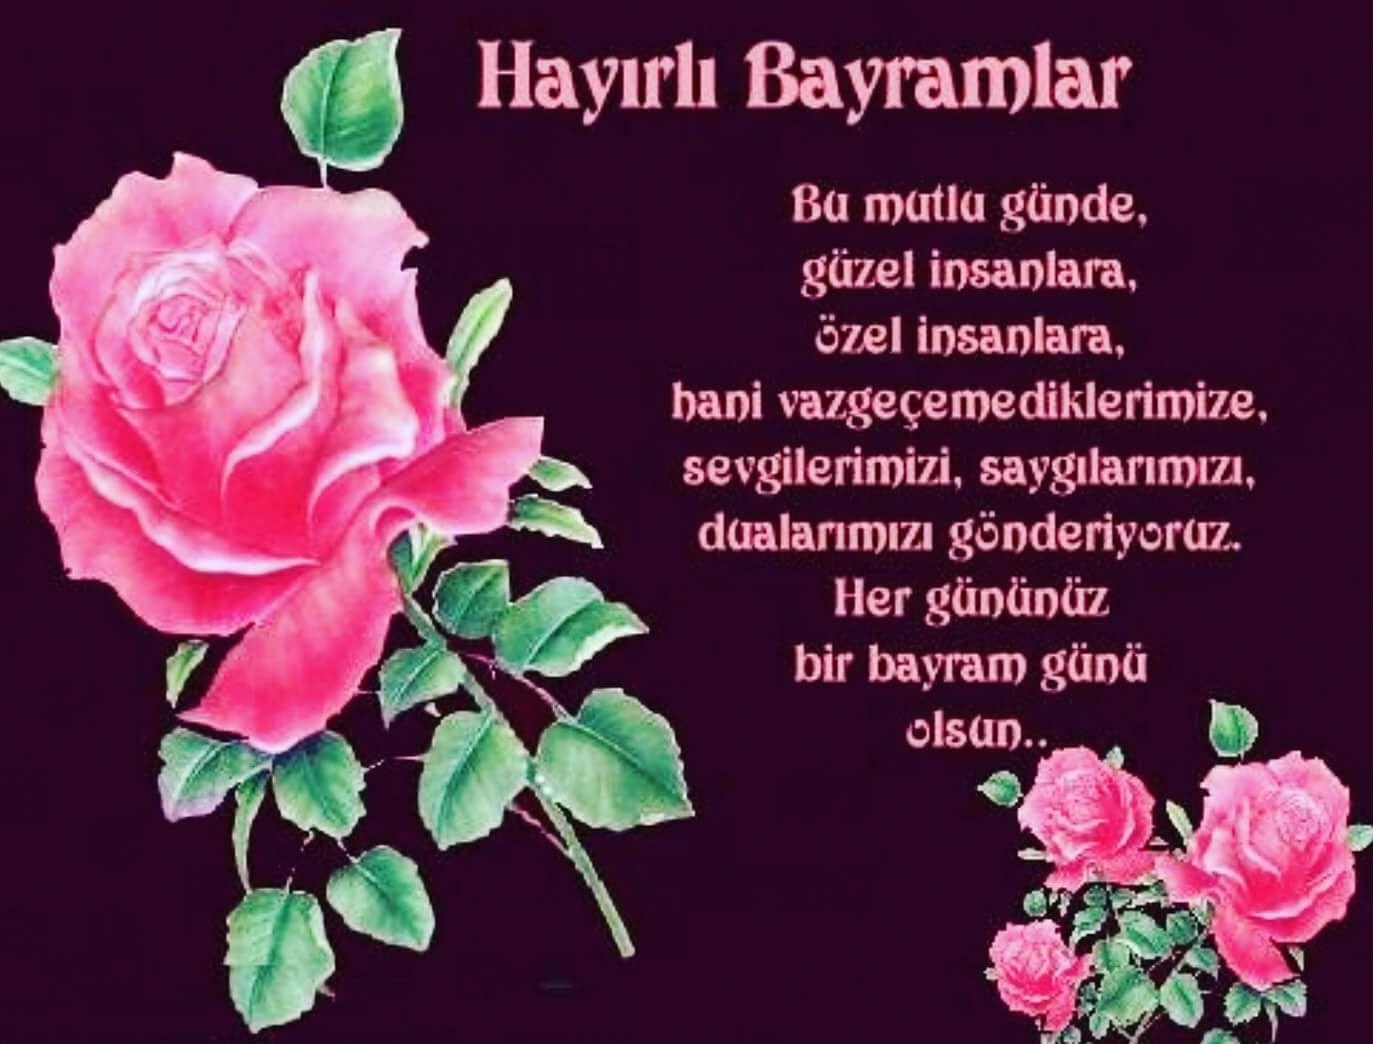 Resimli Ramazan Bayrami Mesajlari Cok Iyi Abi Handmade Flowers Paper Wordpress Blog Instagram Posts